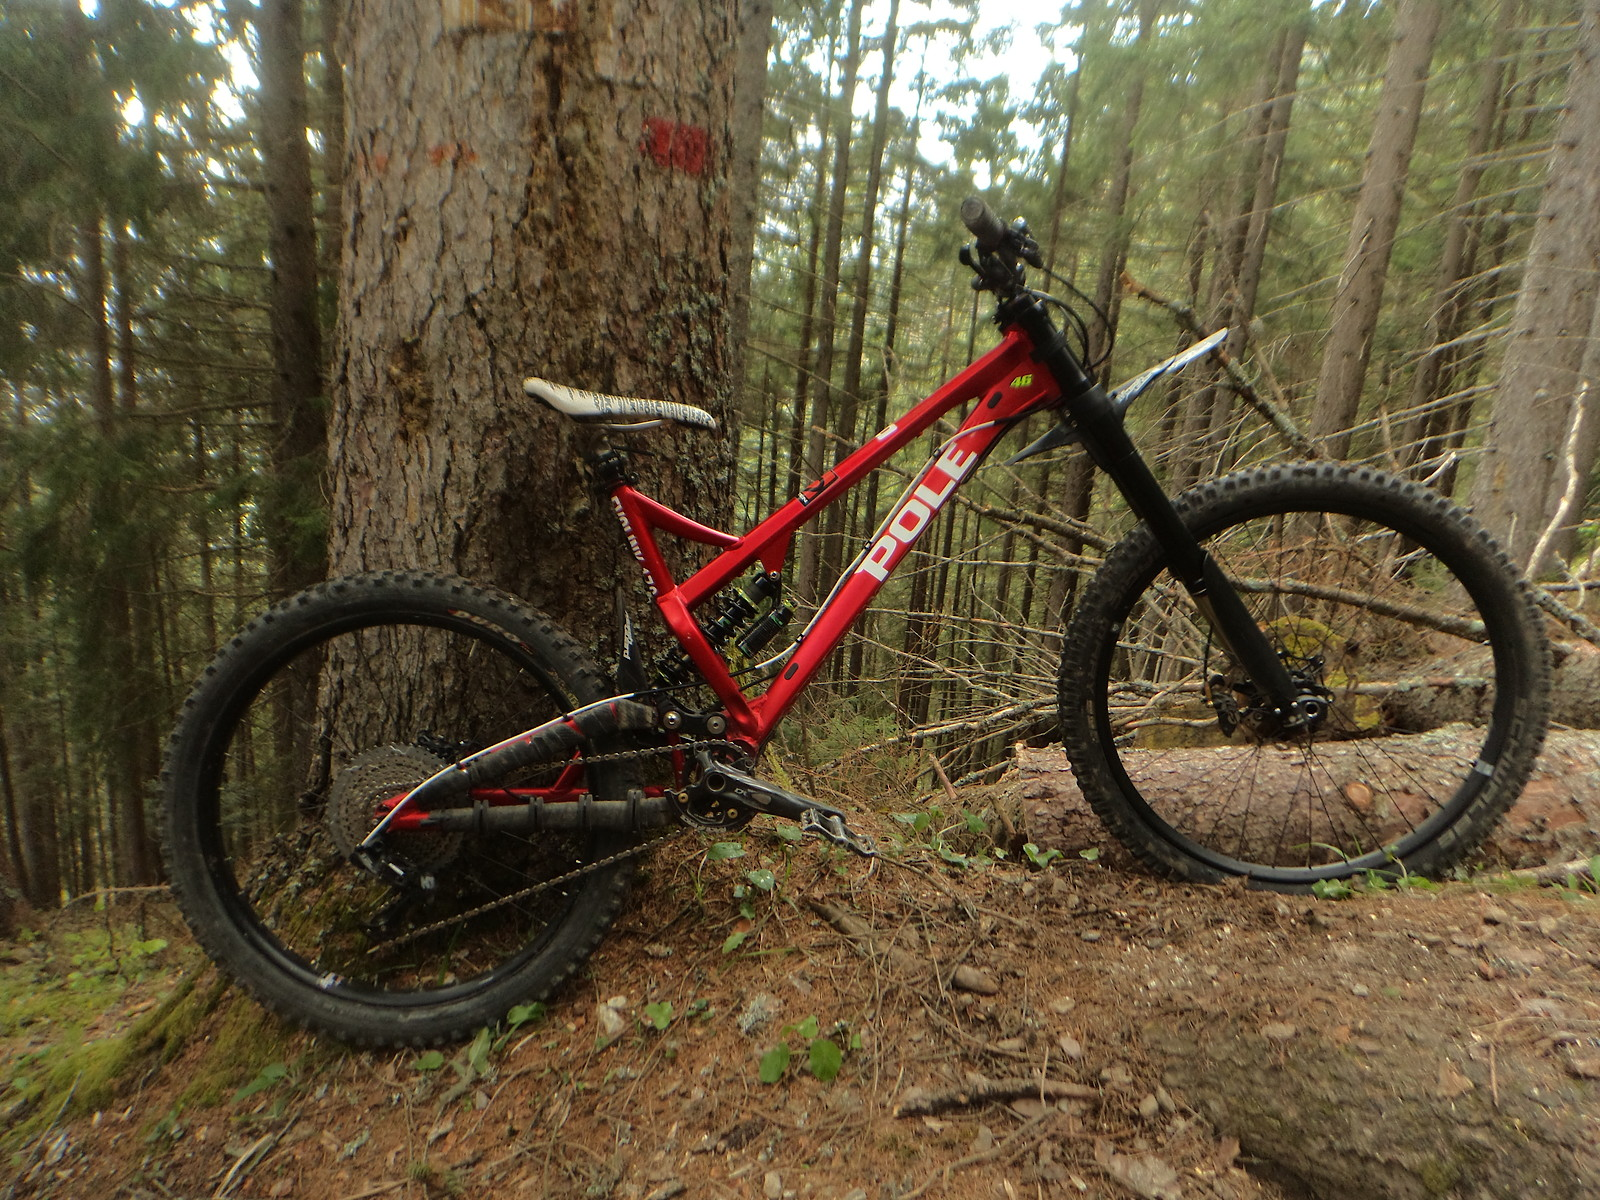 Pole EVOLINK176 - Fred_Pop - Mountain Biking Pictures - Vital MTB